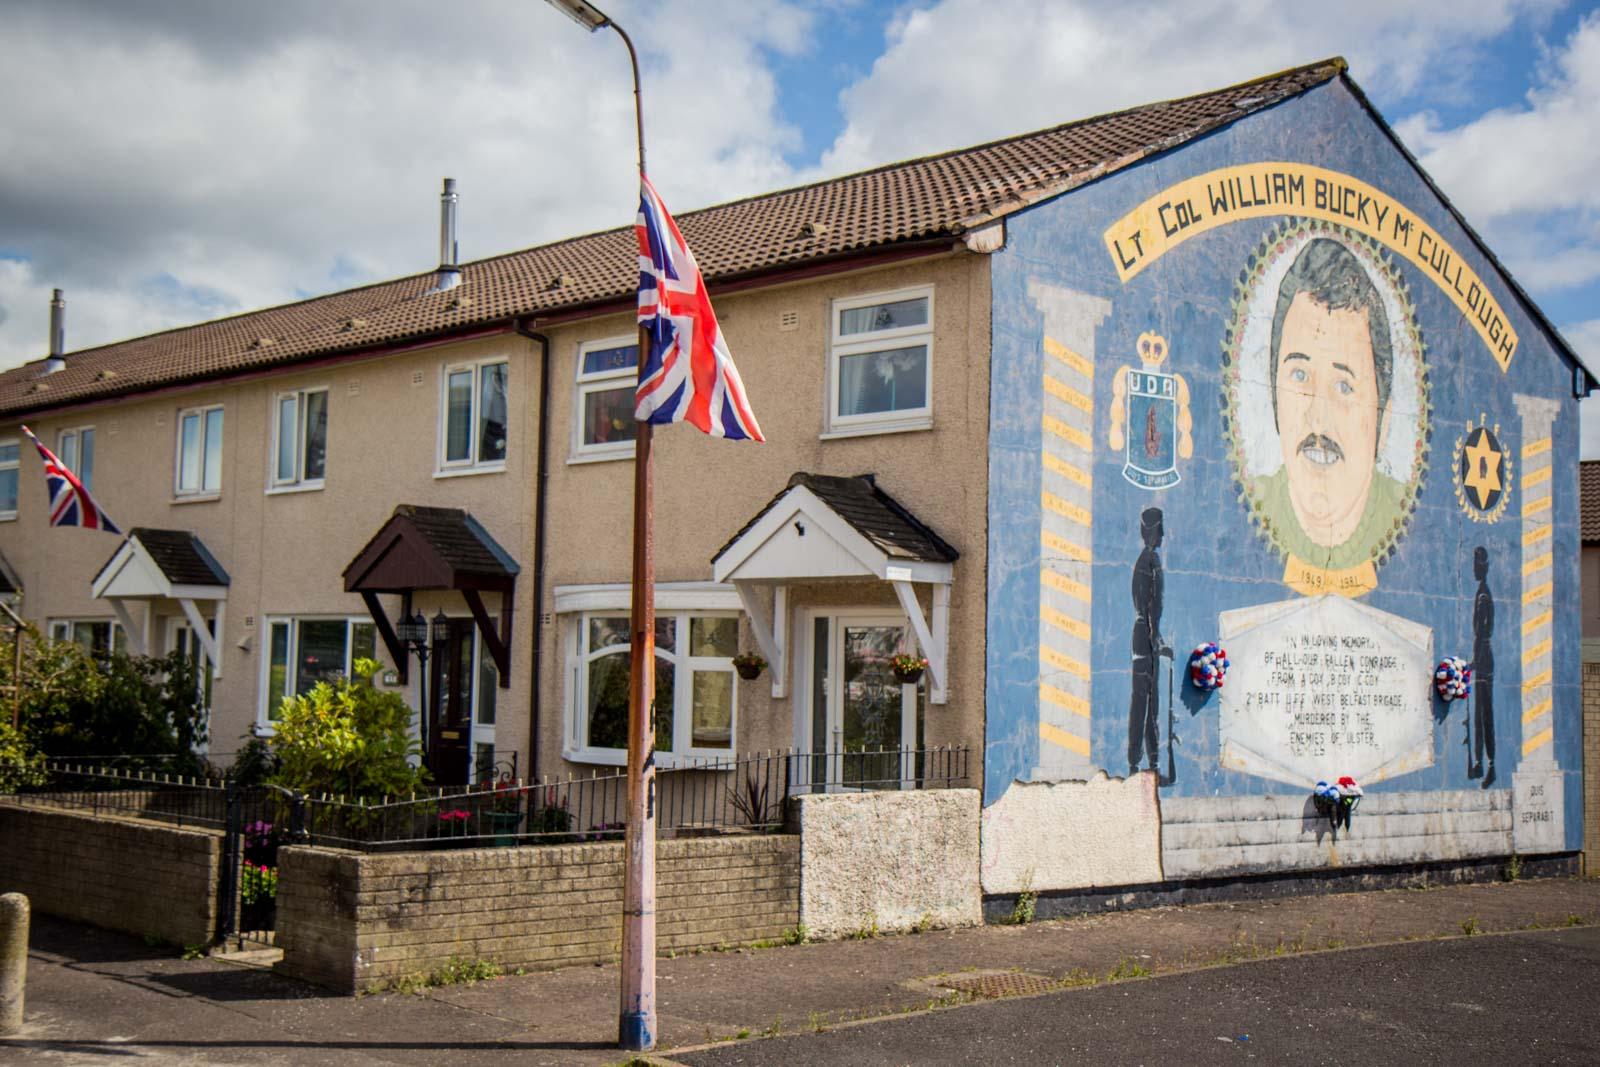 Belfast peace wall murals, Northern Ireland